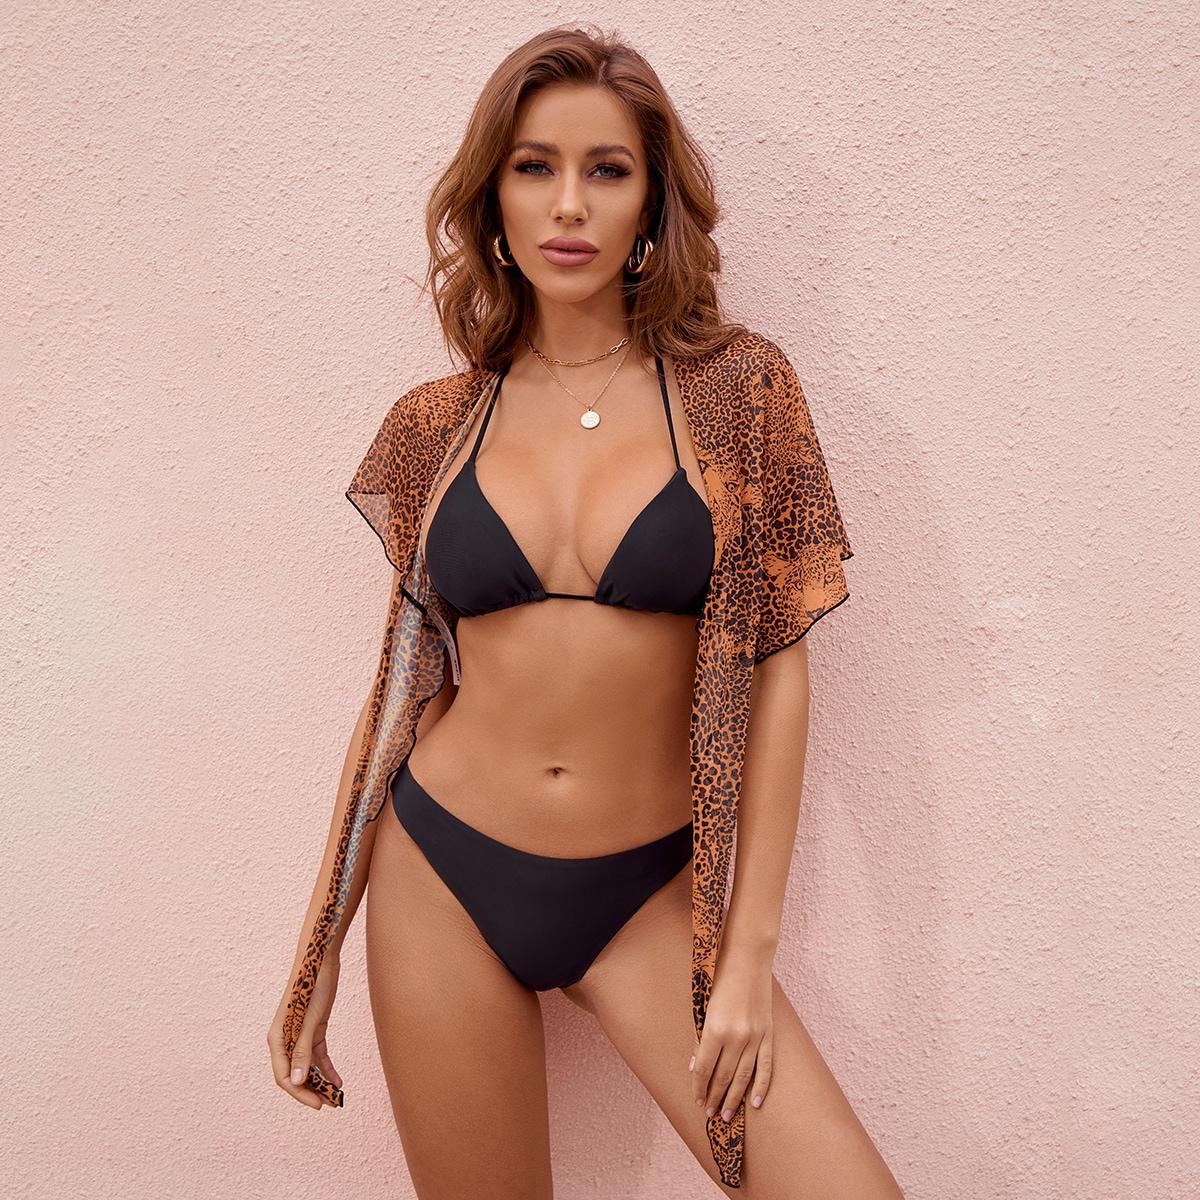 SHEIN / 3pack Halter Bikini Swimsuit & Leopard Beach Skirt